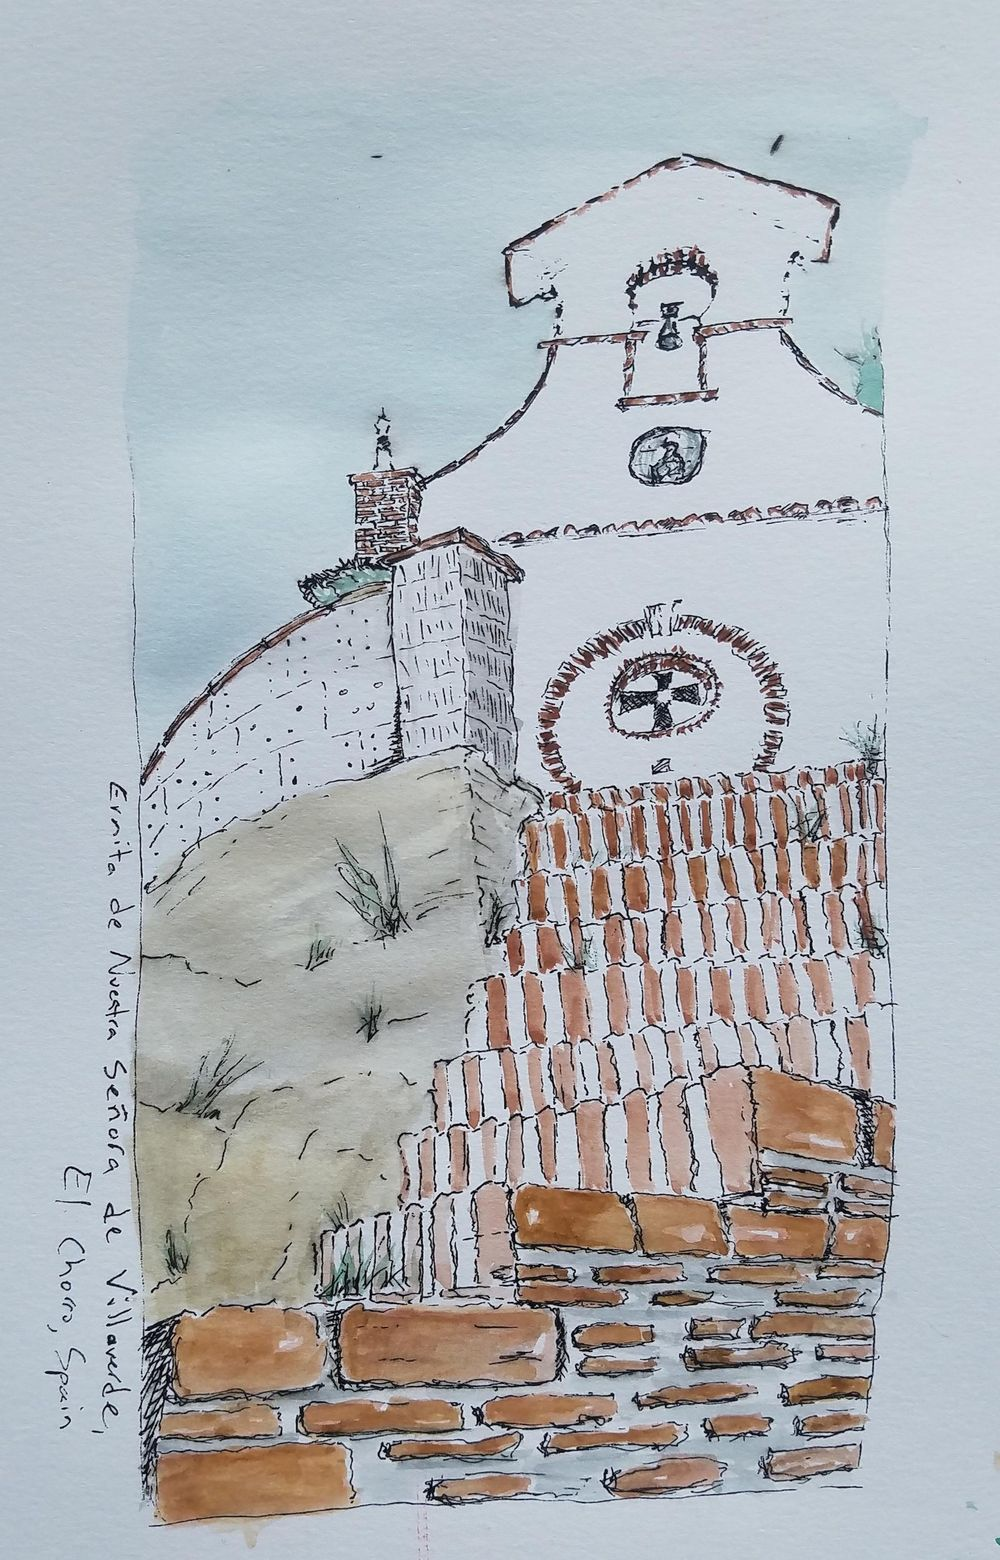 El Chorro, Spain - church - image 2 - student project